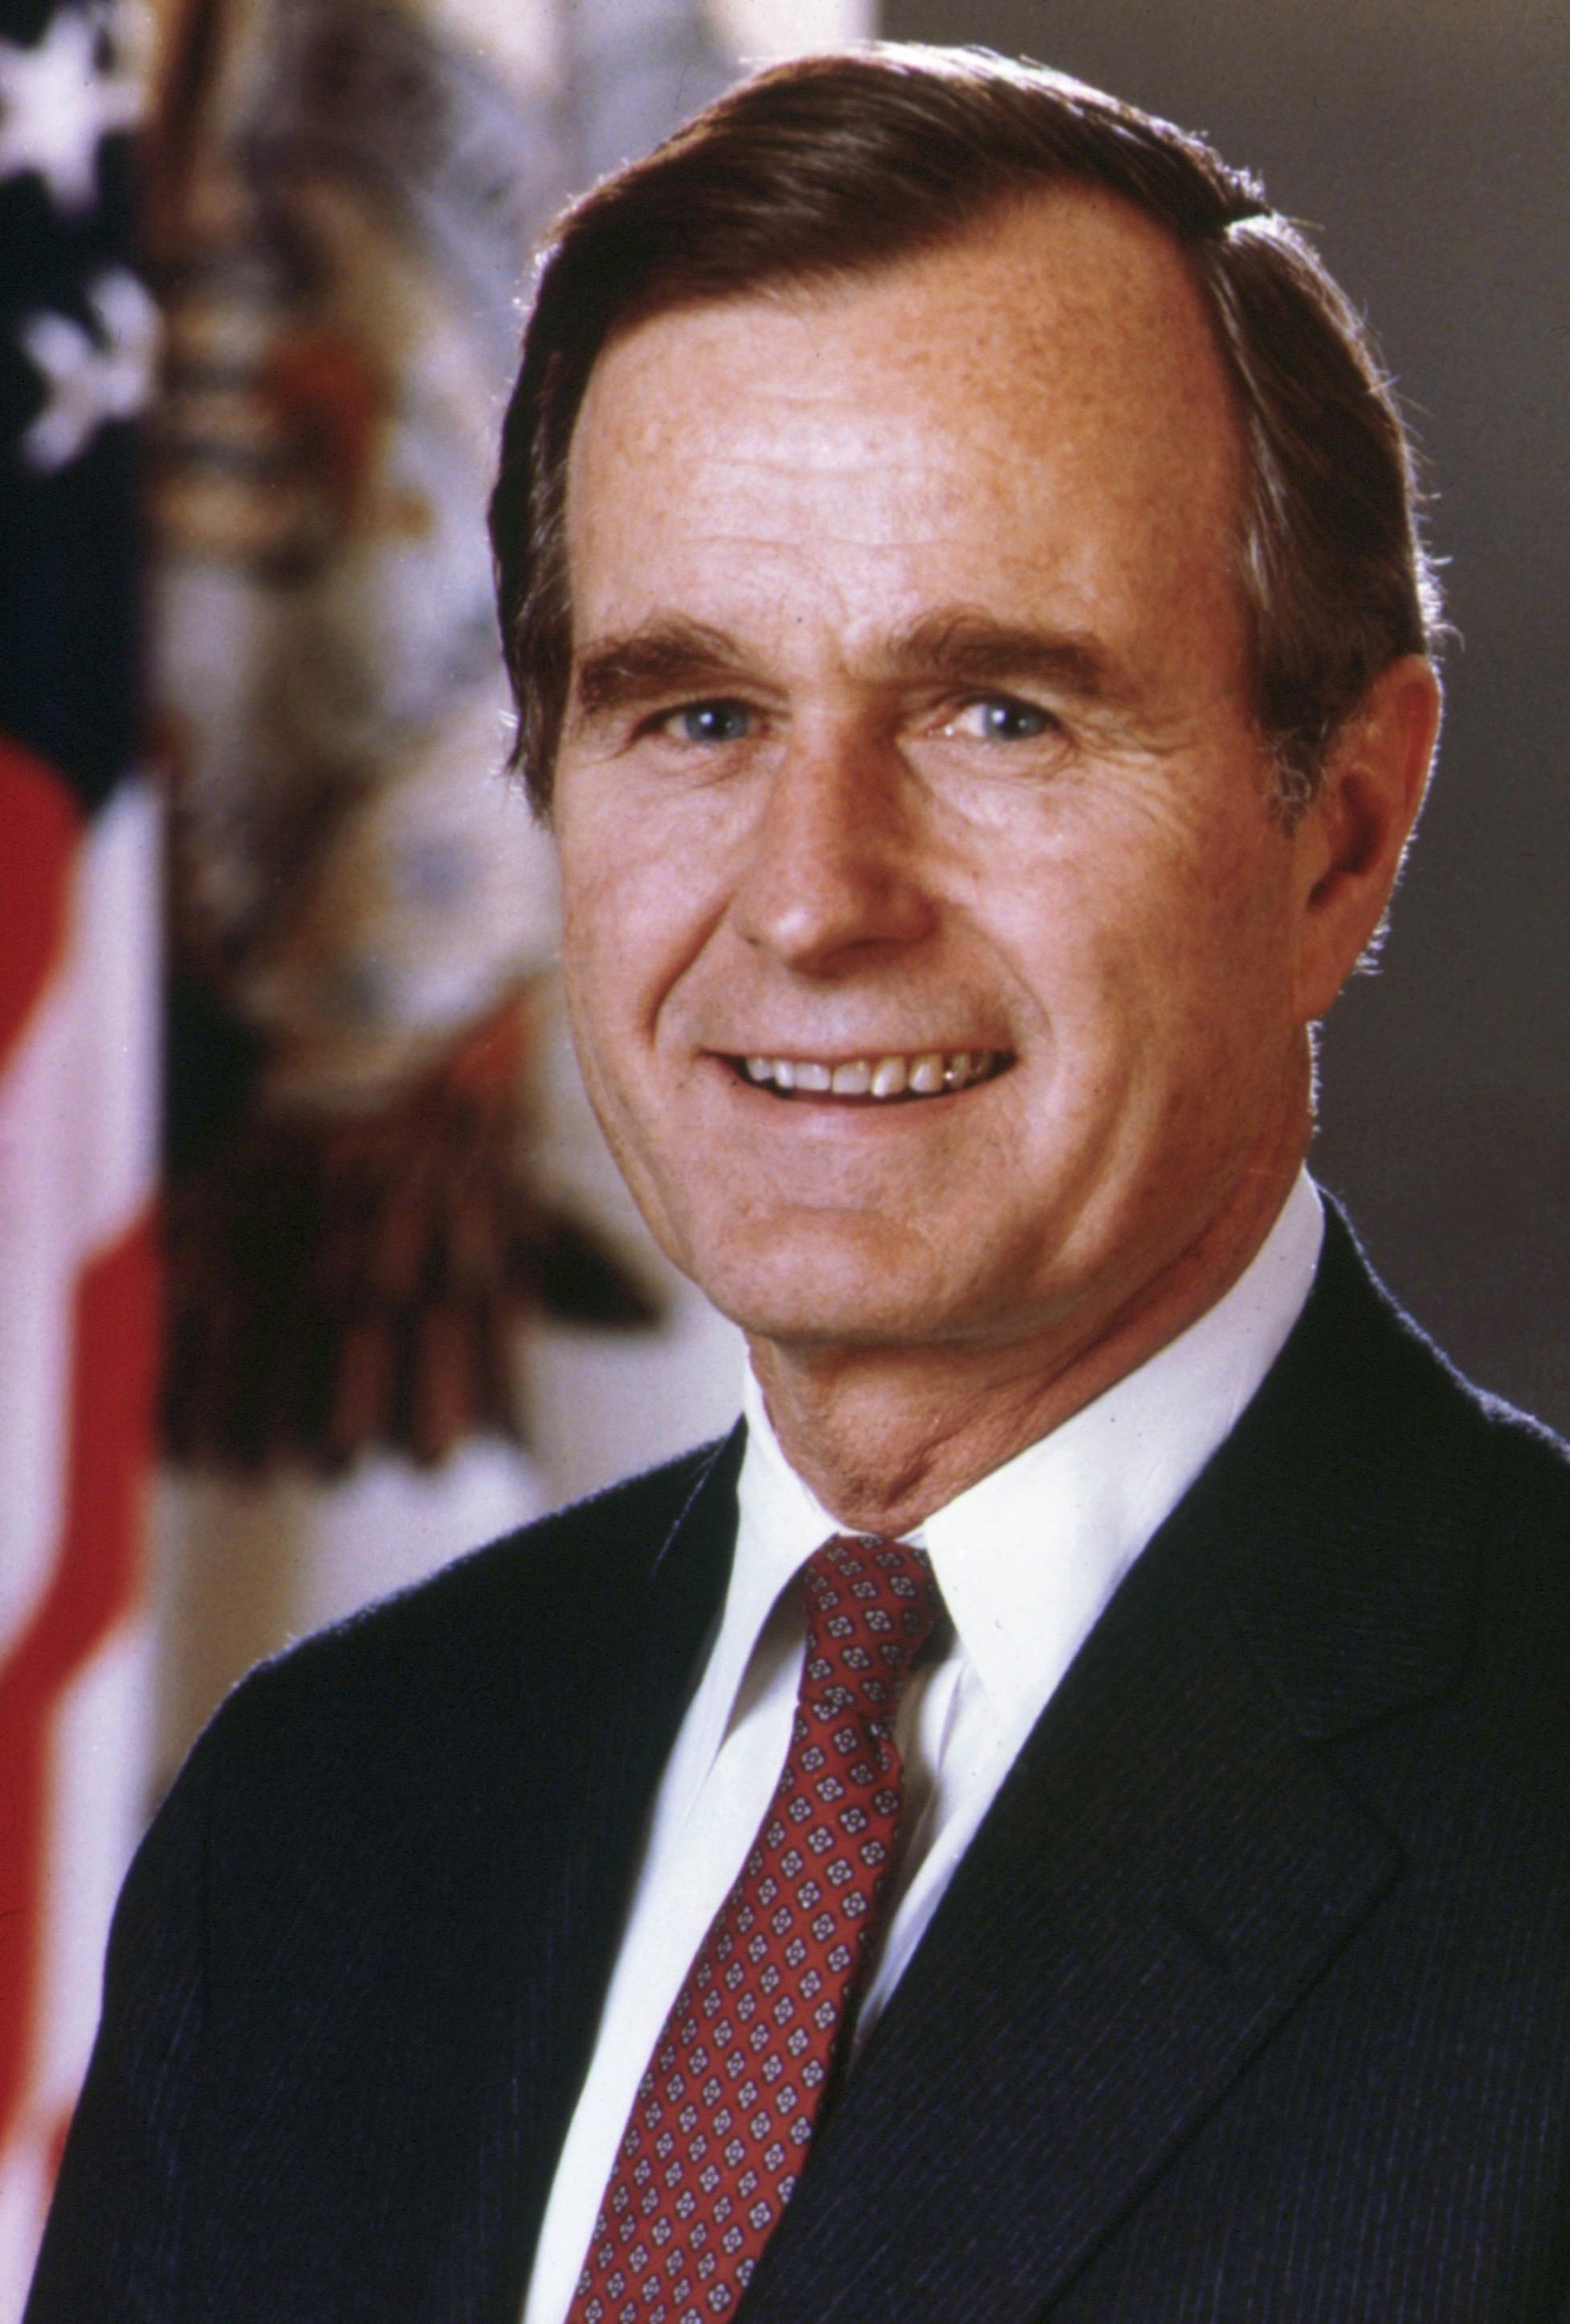 George_HW_Bush.jpg